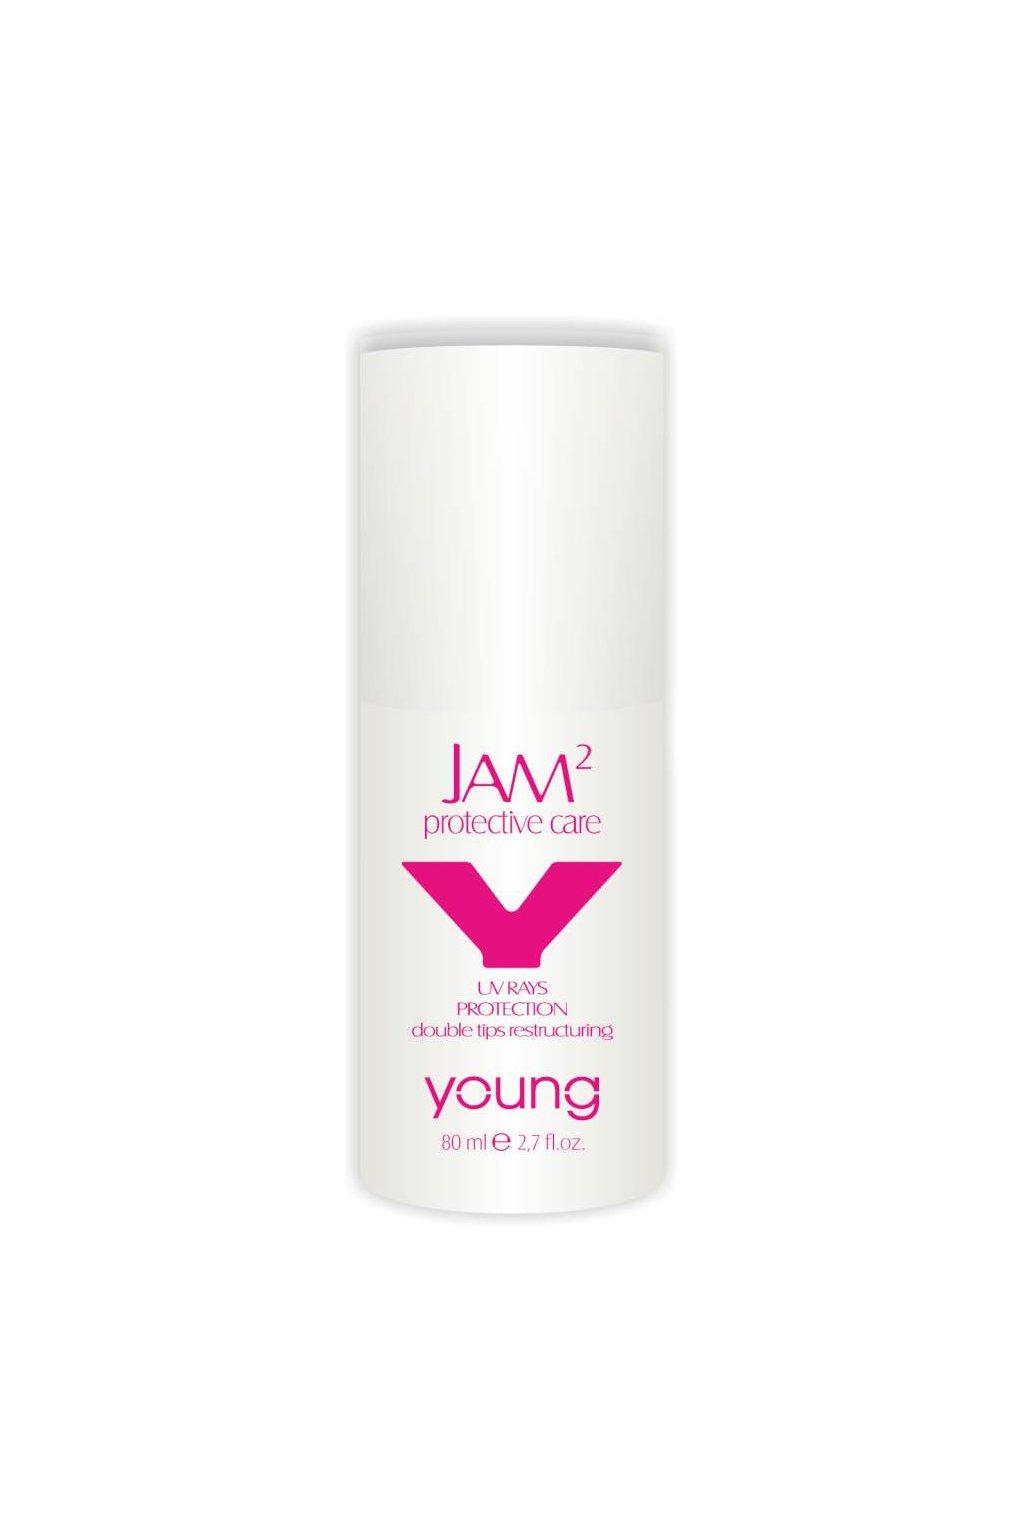 8933 young jam2 tekute krystaly ochrana pro delky a konecky s extra leskem 80ml